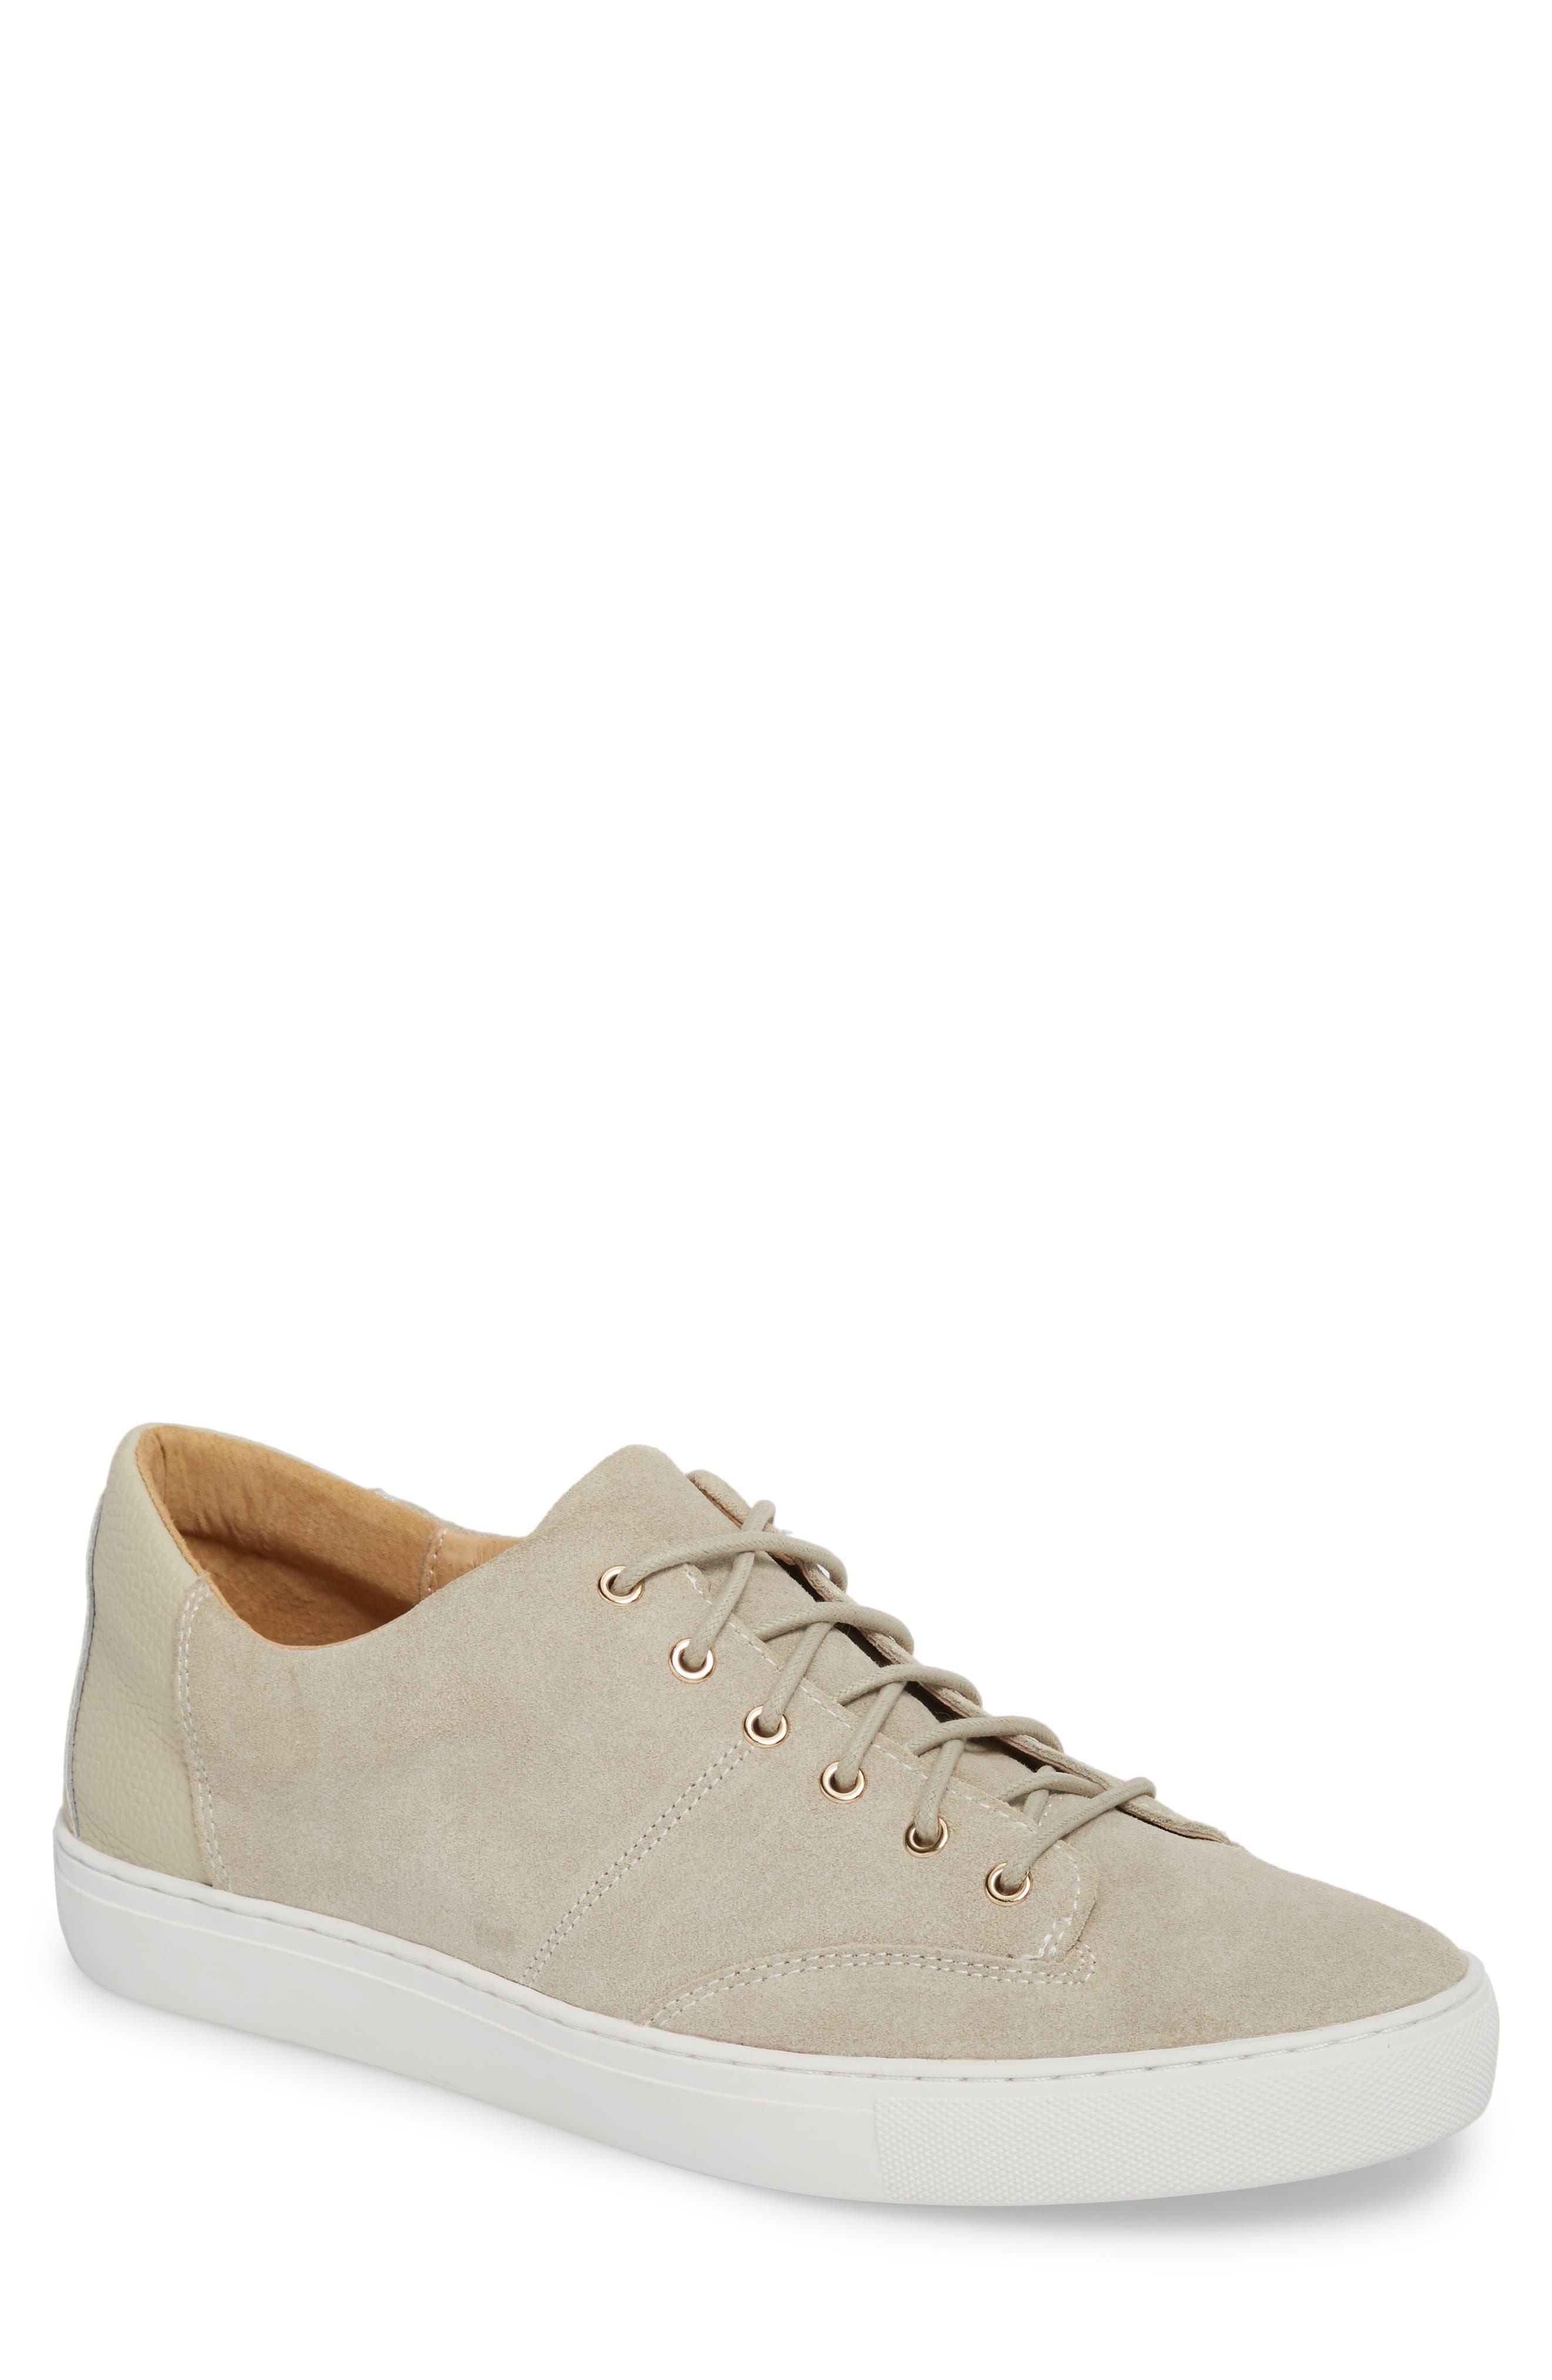 Alternate Image 1 Selected - TCG Cooper Sneaker (Men)